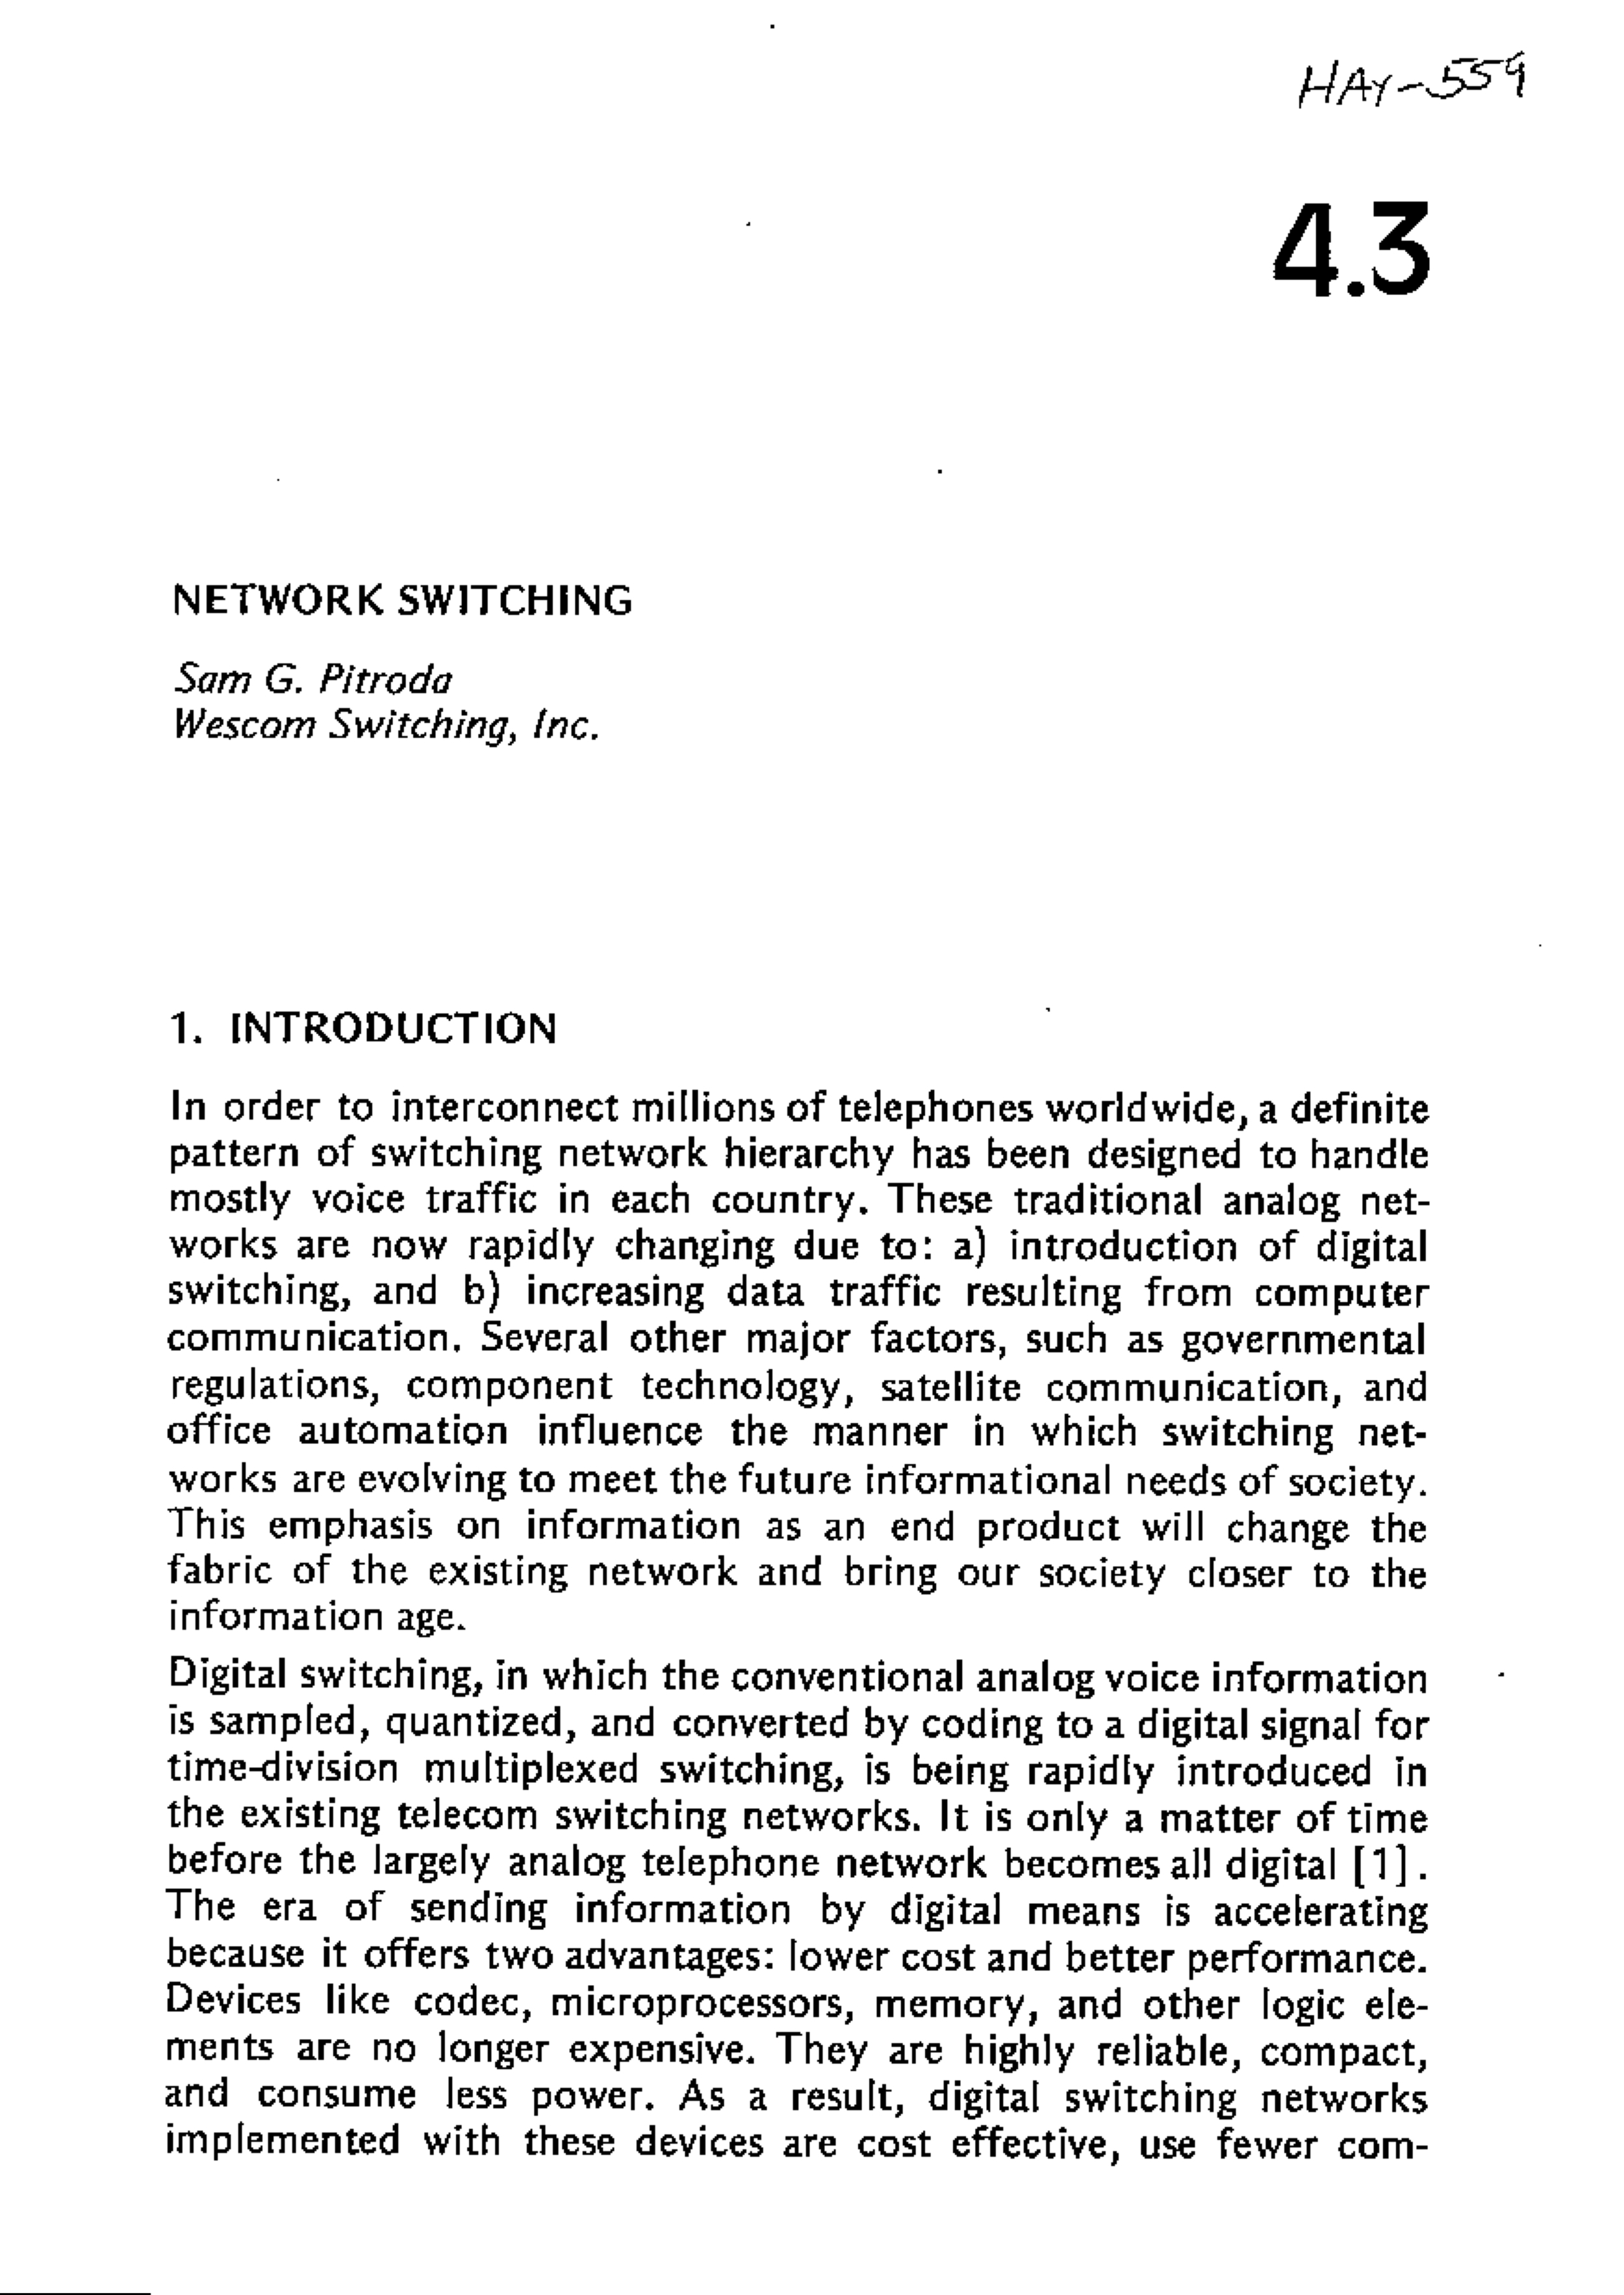 Network Switching,Wells Bindery, Waltham, MA, 1984